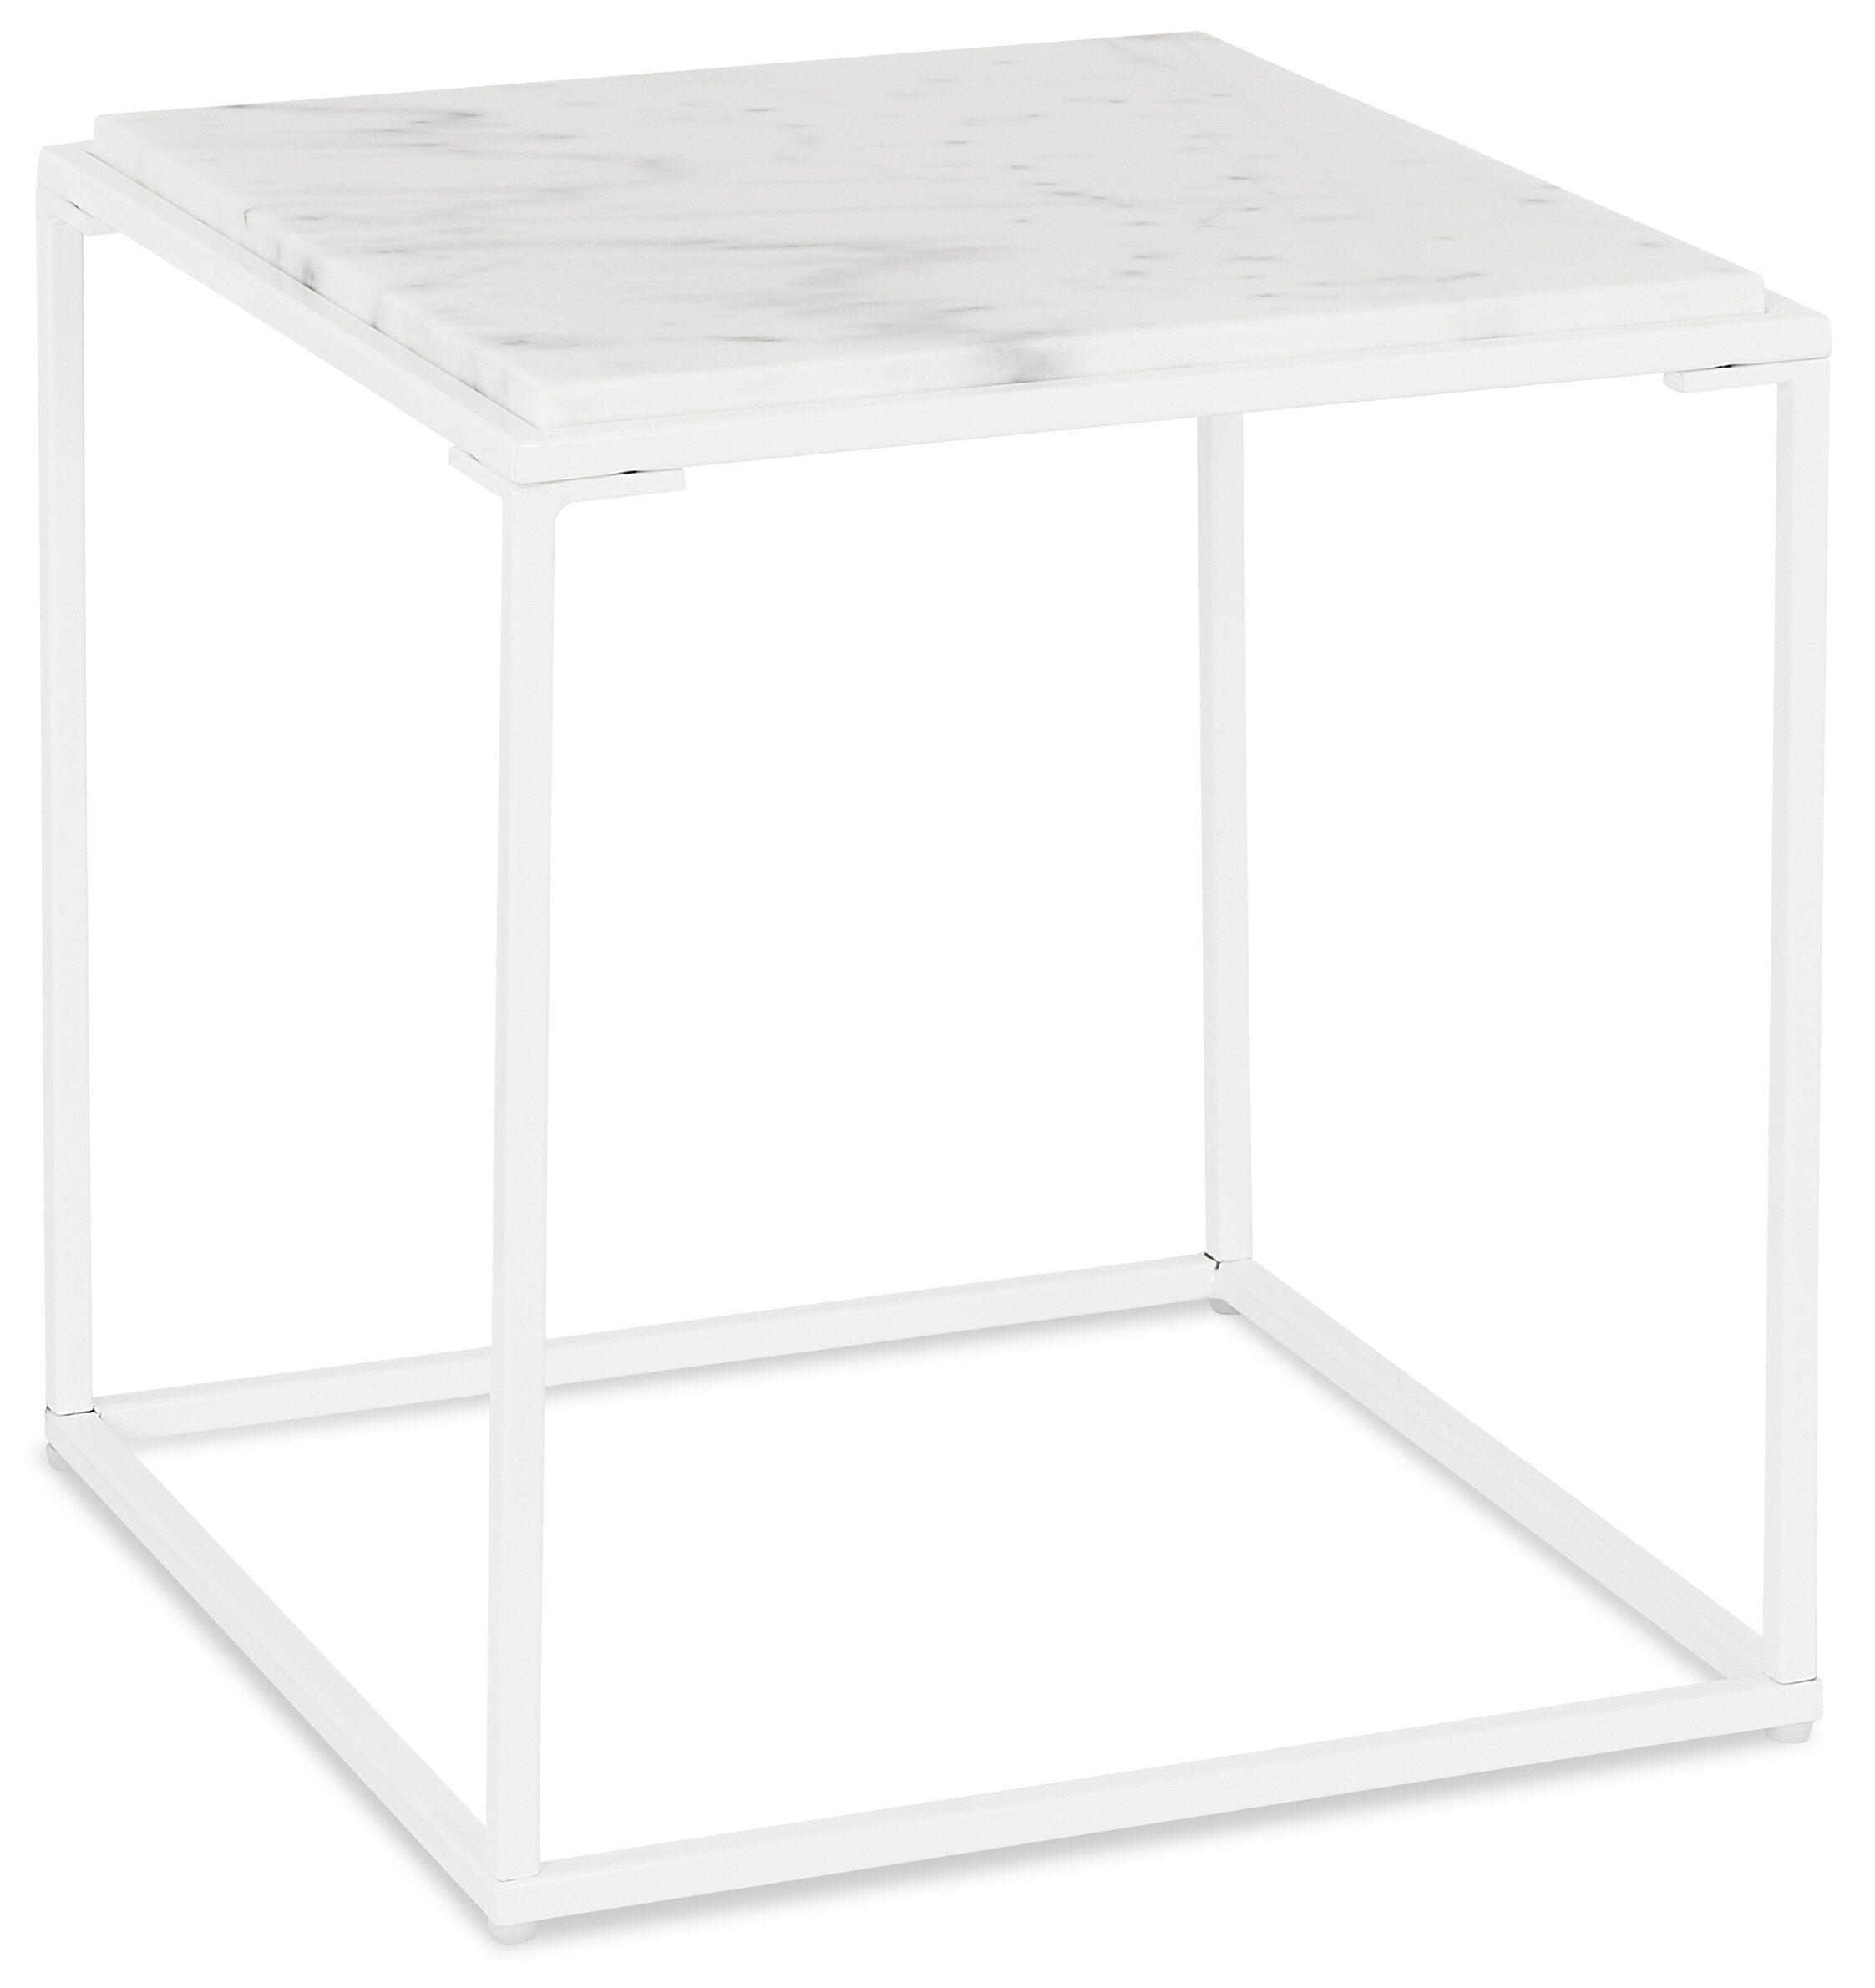 Table basse d'appoint 'SPIN MINI' blanche en pierre marbrée